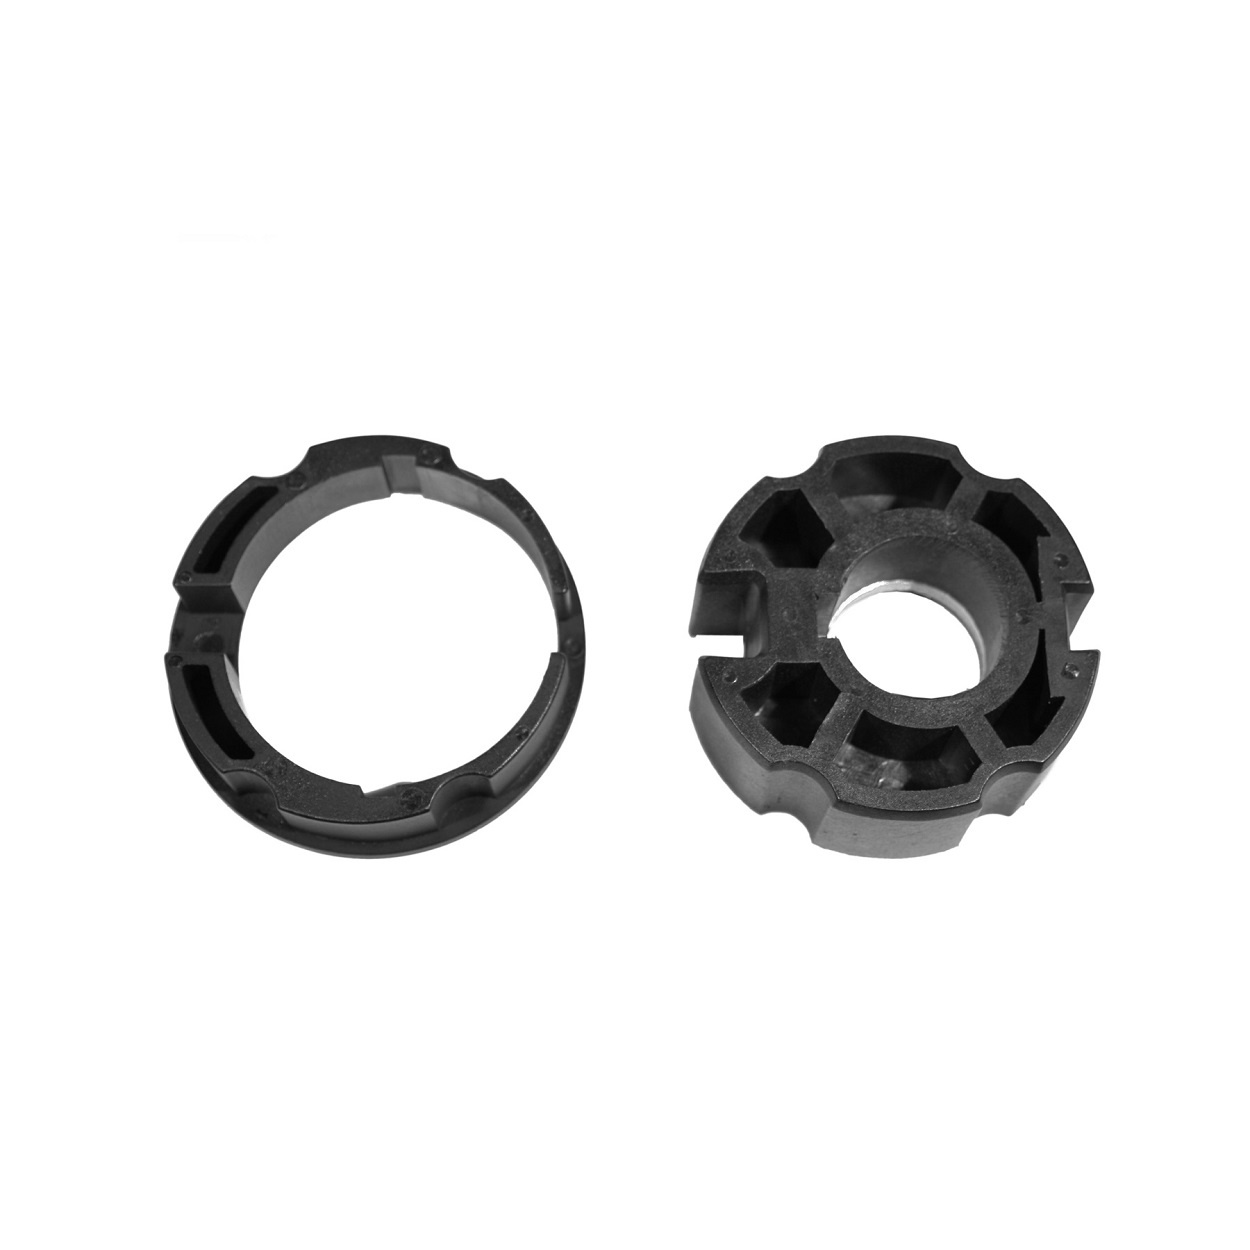 Brel Adaptieset 55 mm - as Ø 78 mm